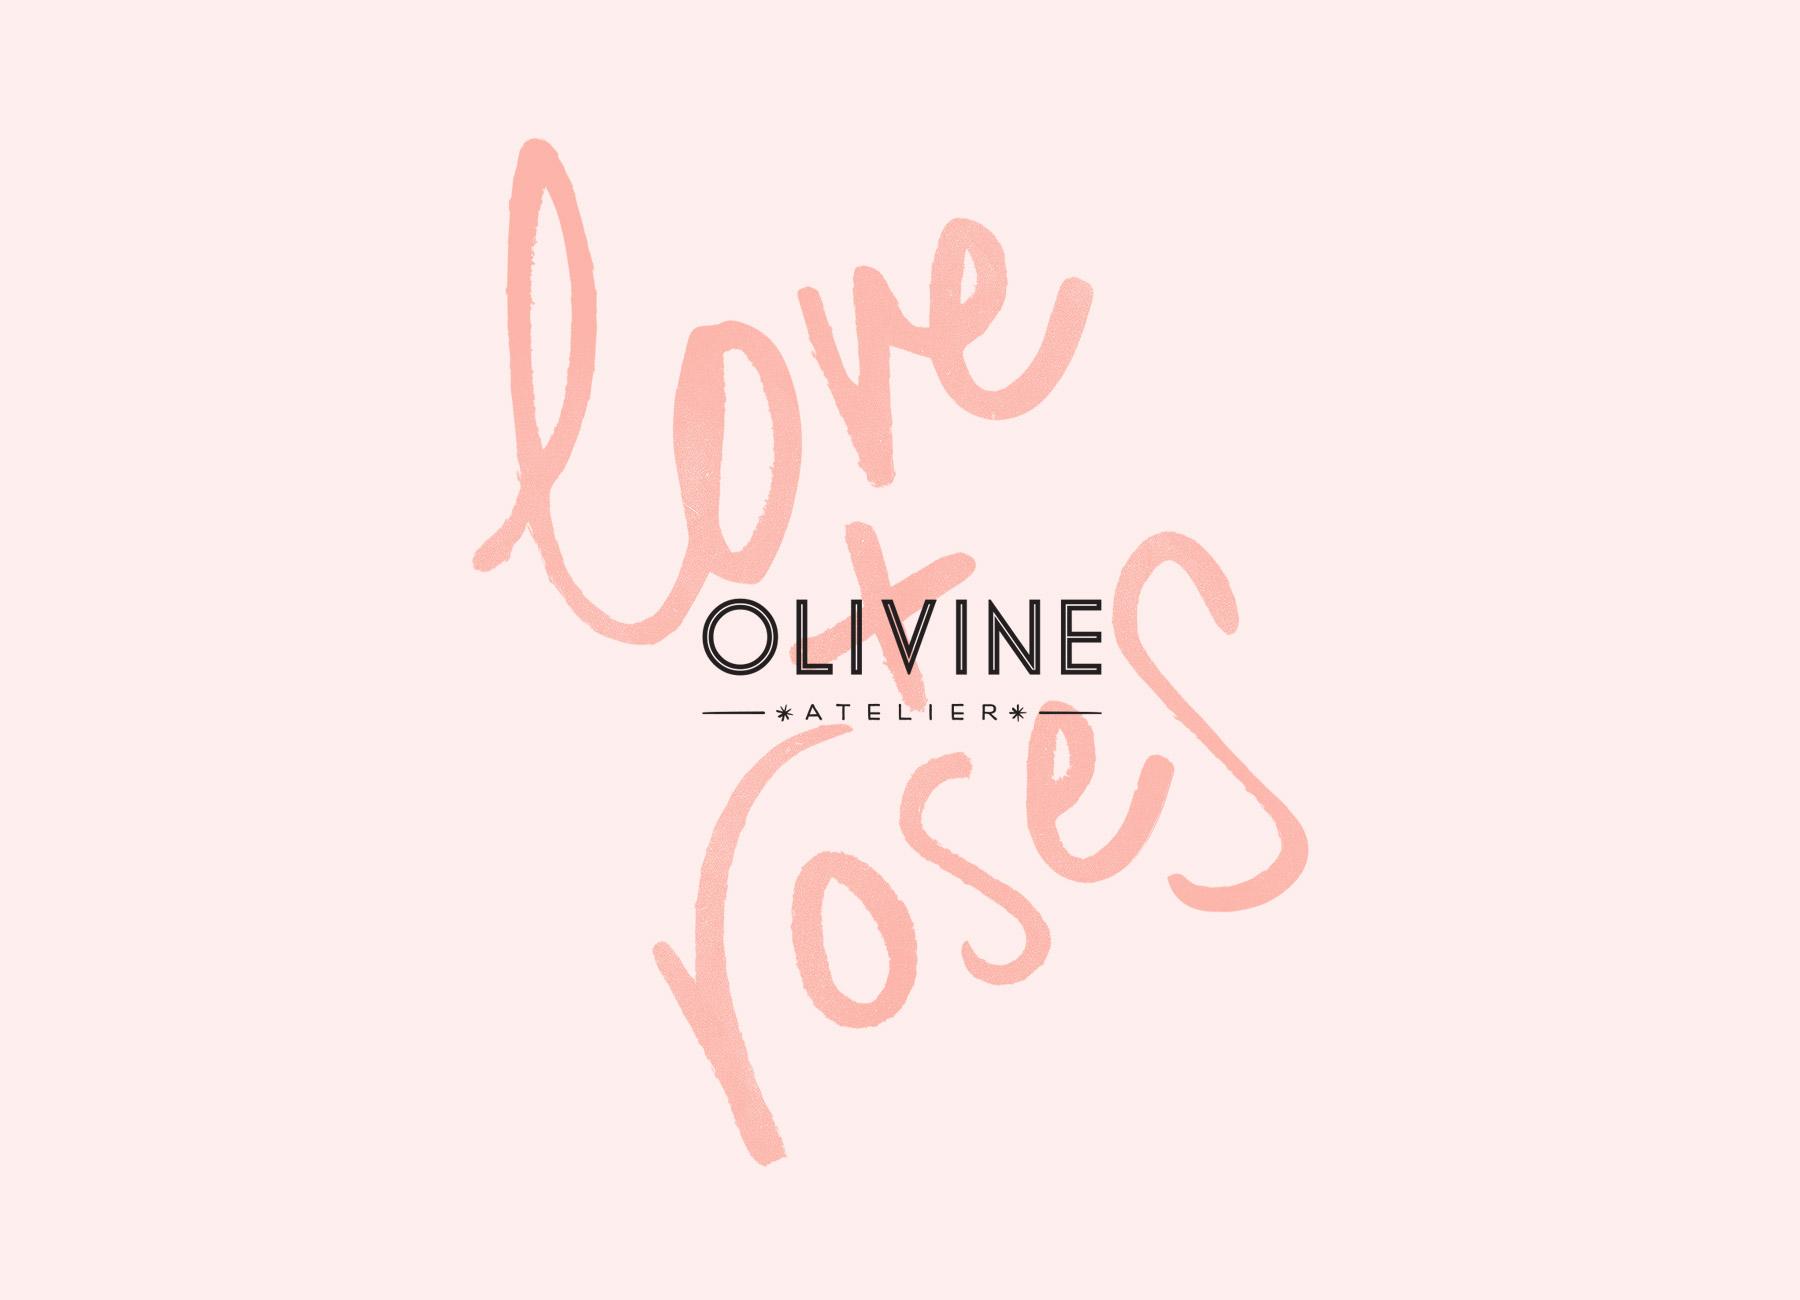 Branch | Olivine Atelier Love + Roses